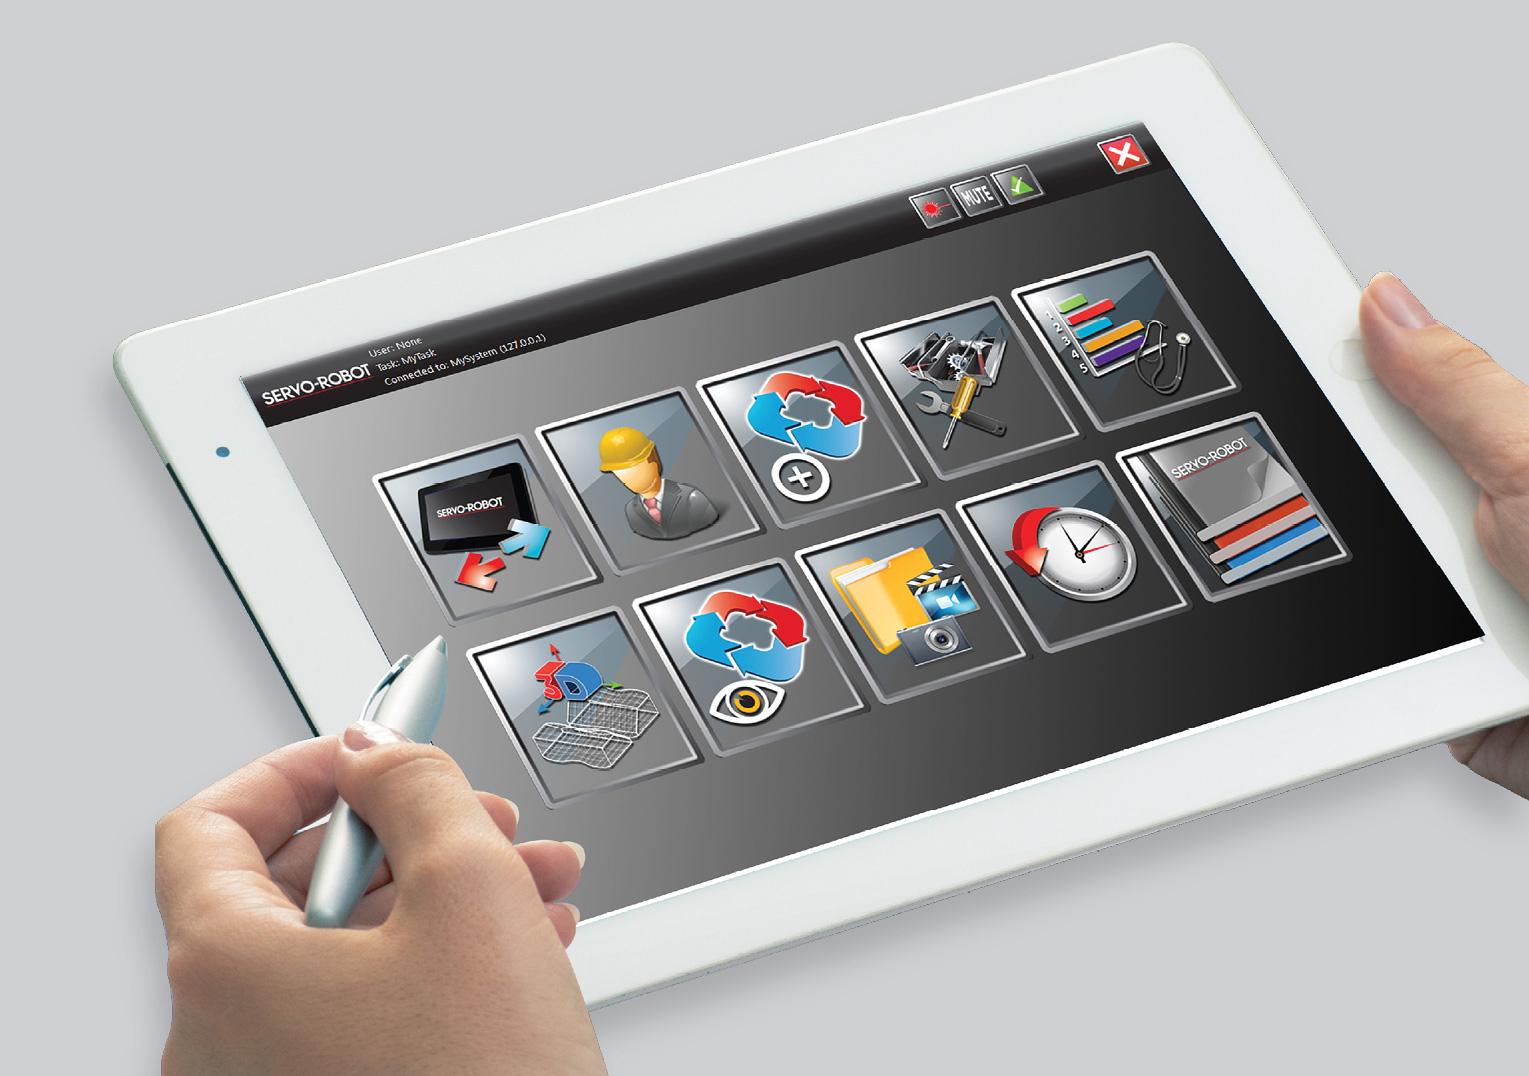 FRUIT - FRIENDLY USER INTERFACE TECHNOLOGY FOR SERVO-ROBOT 3D robotvision™ SYSTEMS